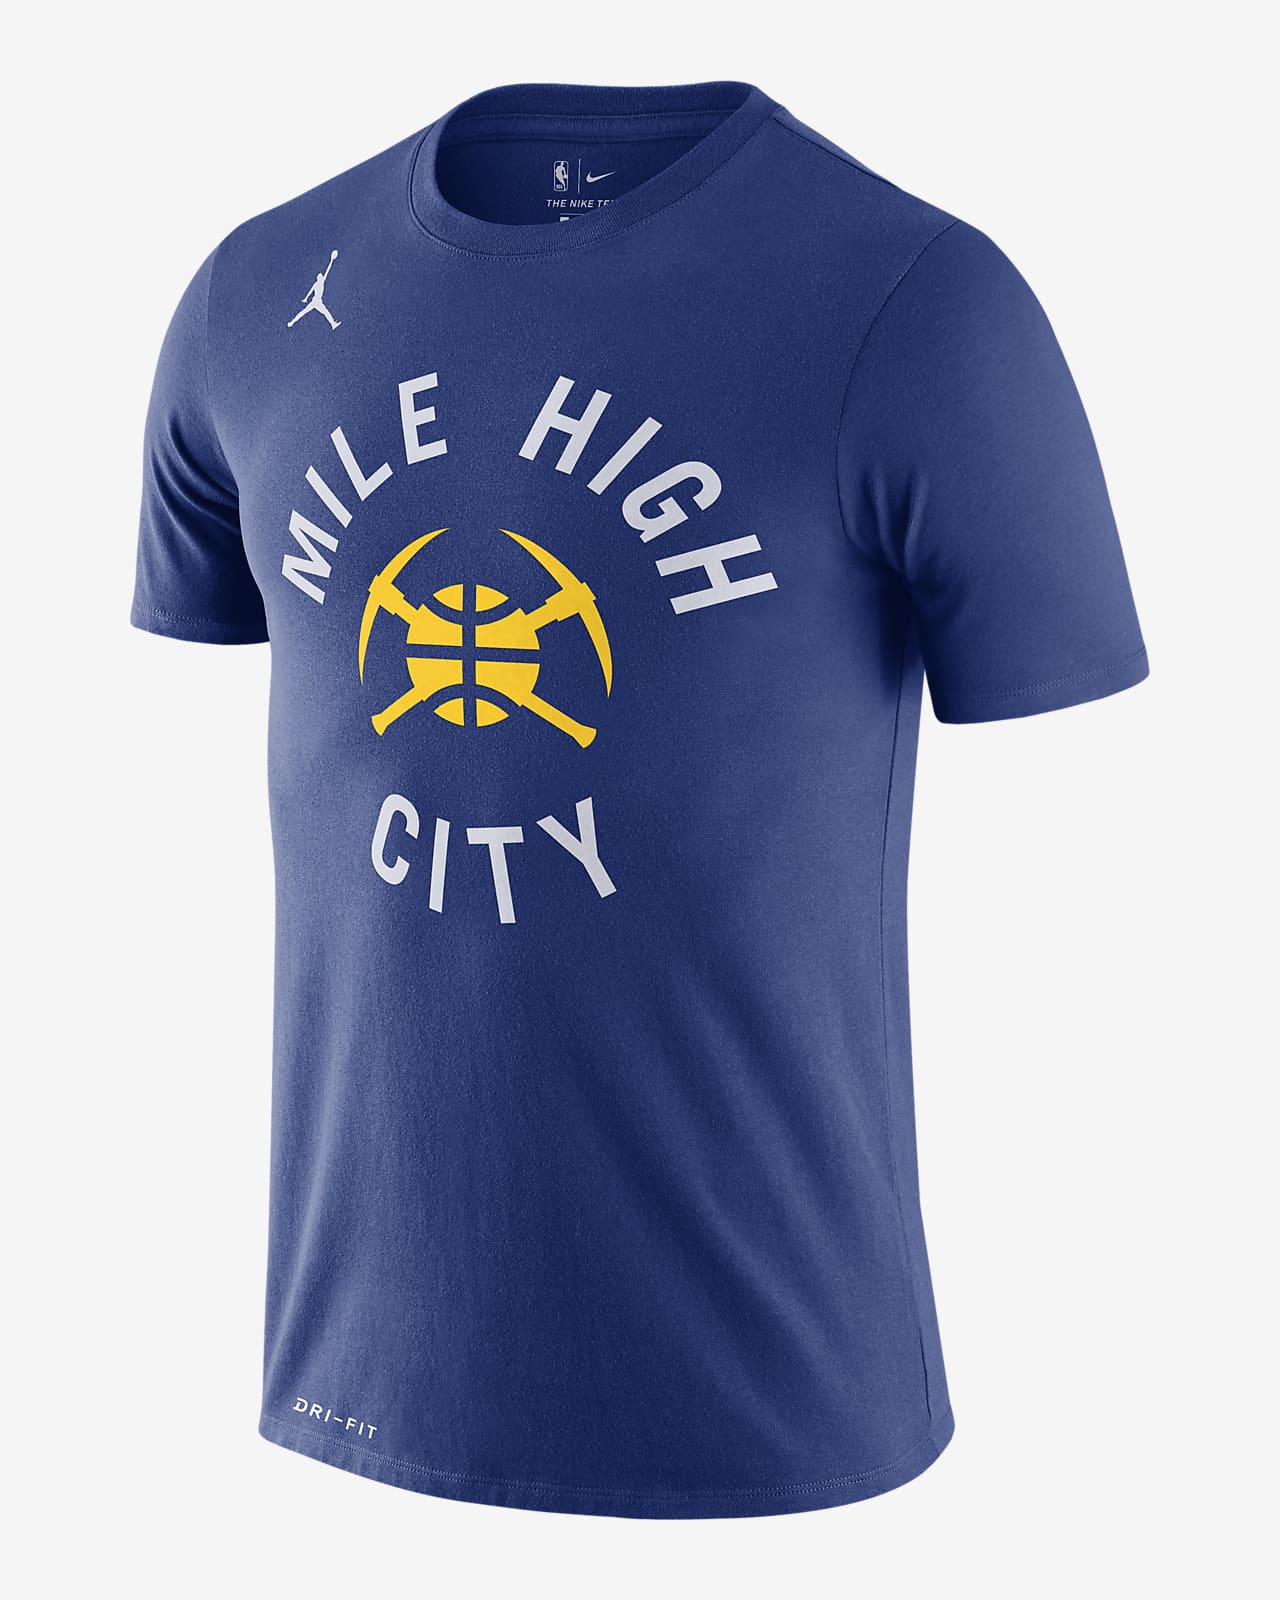 Nuggets Statement Edition Men's Jordan Dri-FIT NBA T-Shirt